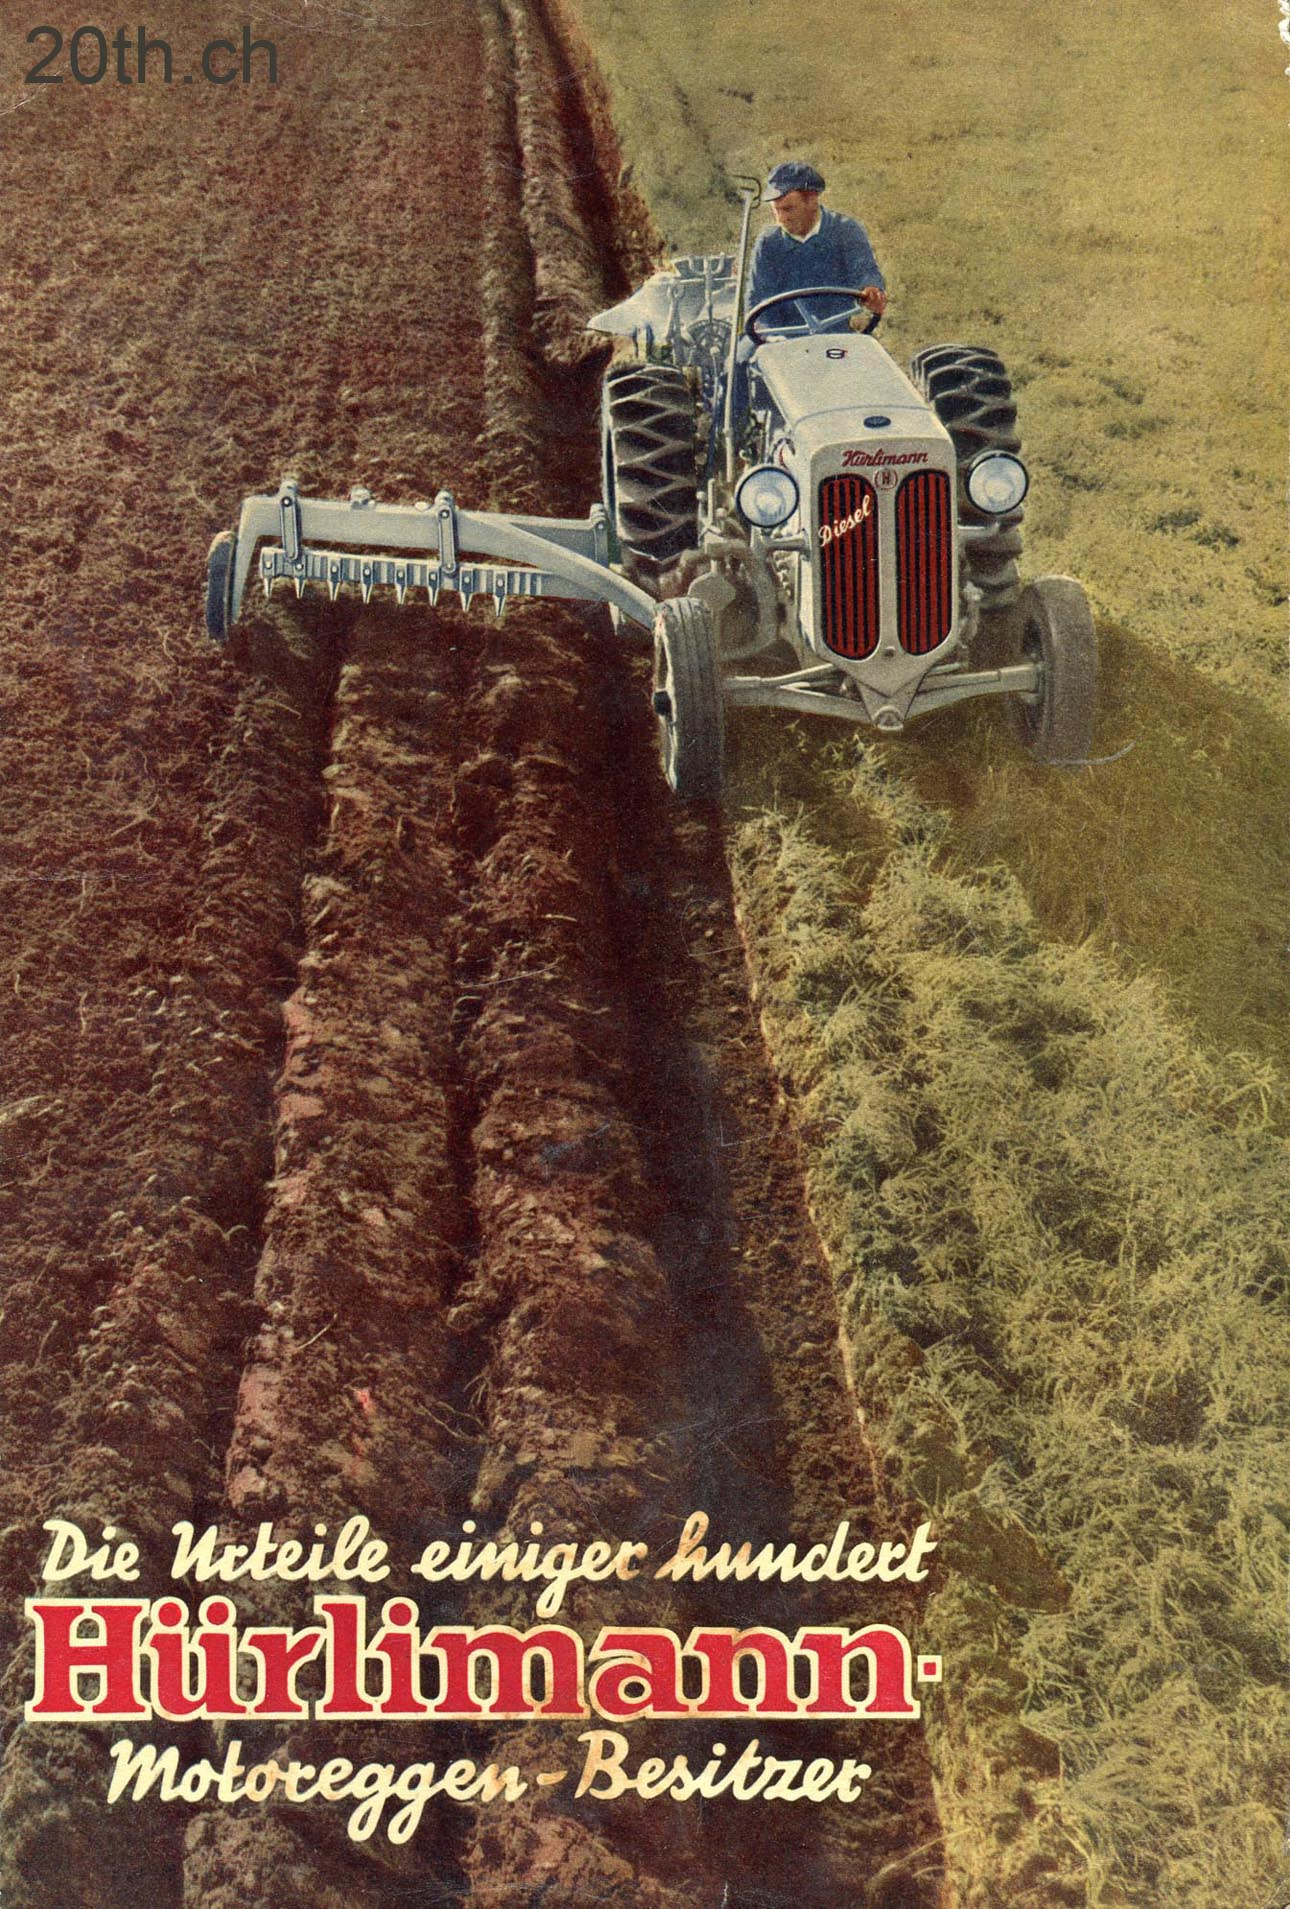 Hurlimann Tracteur Ancien